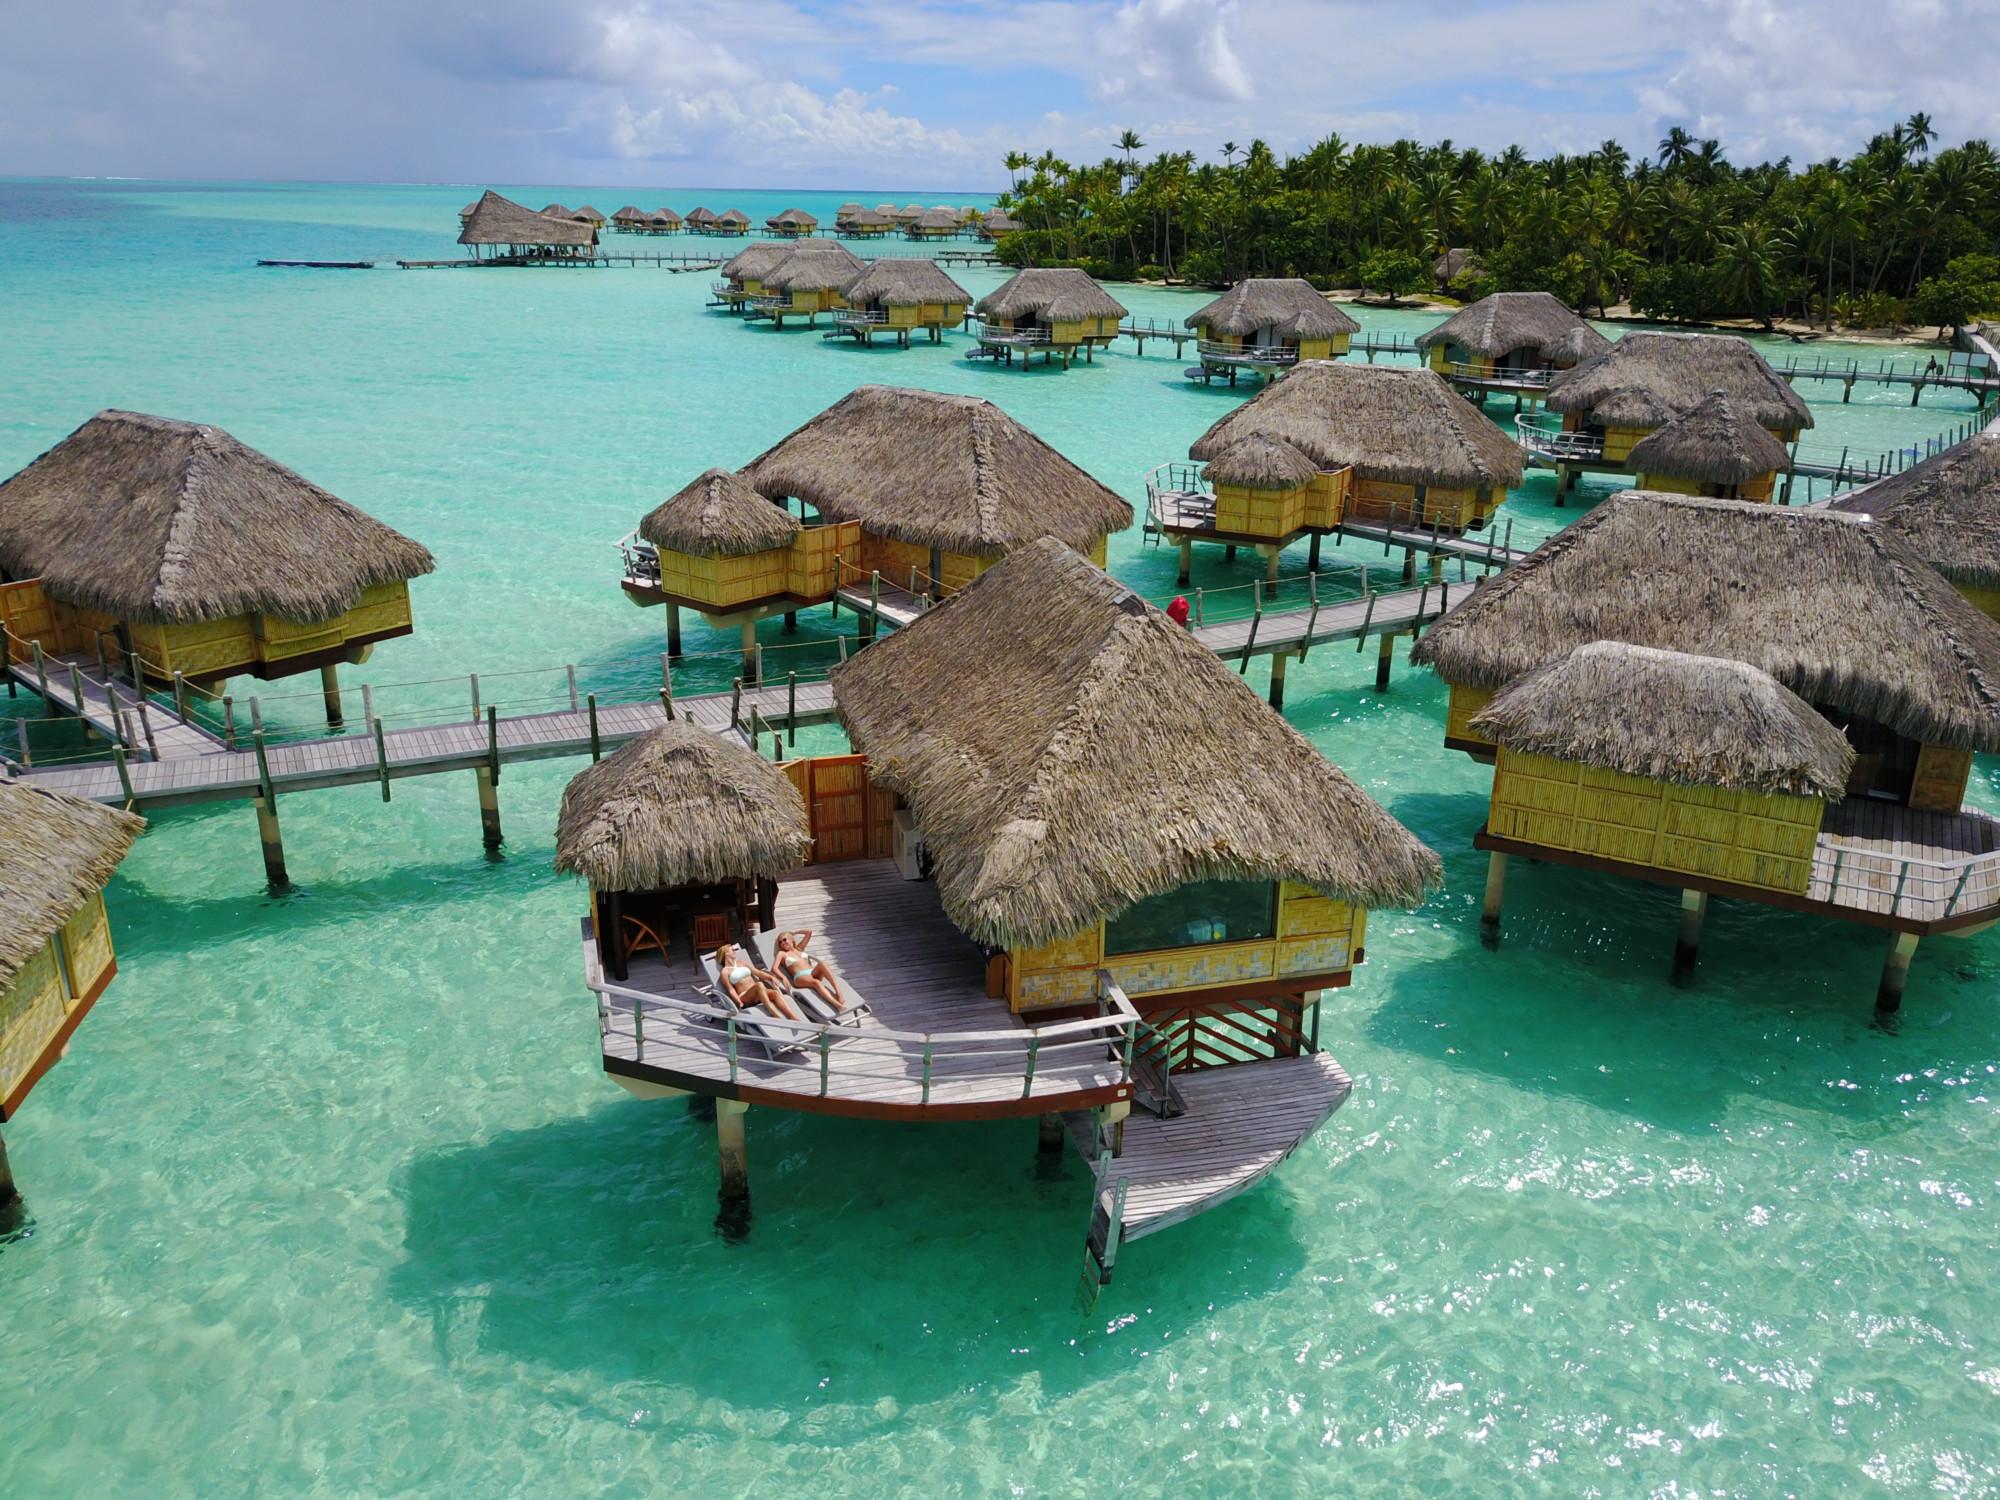 Le Taha'a Island Resort